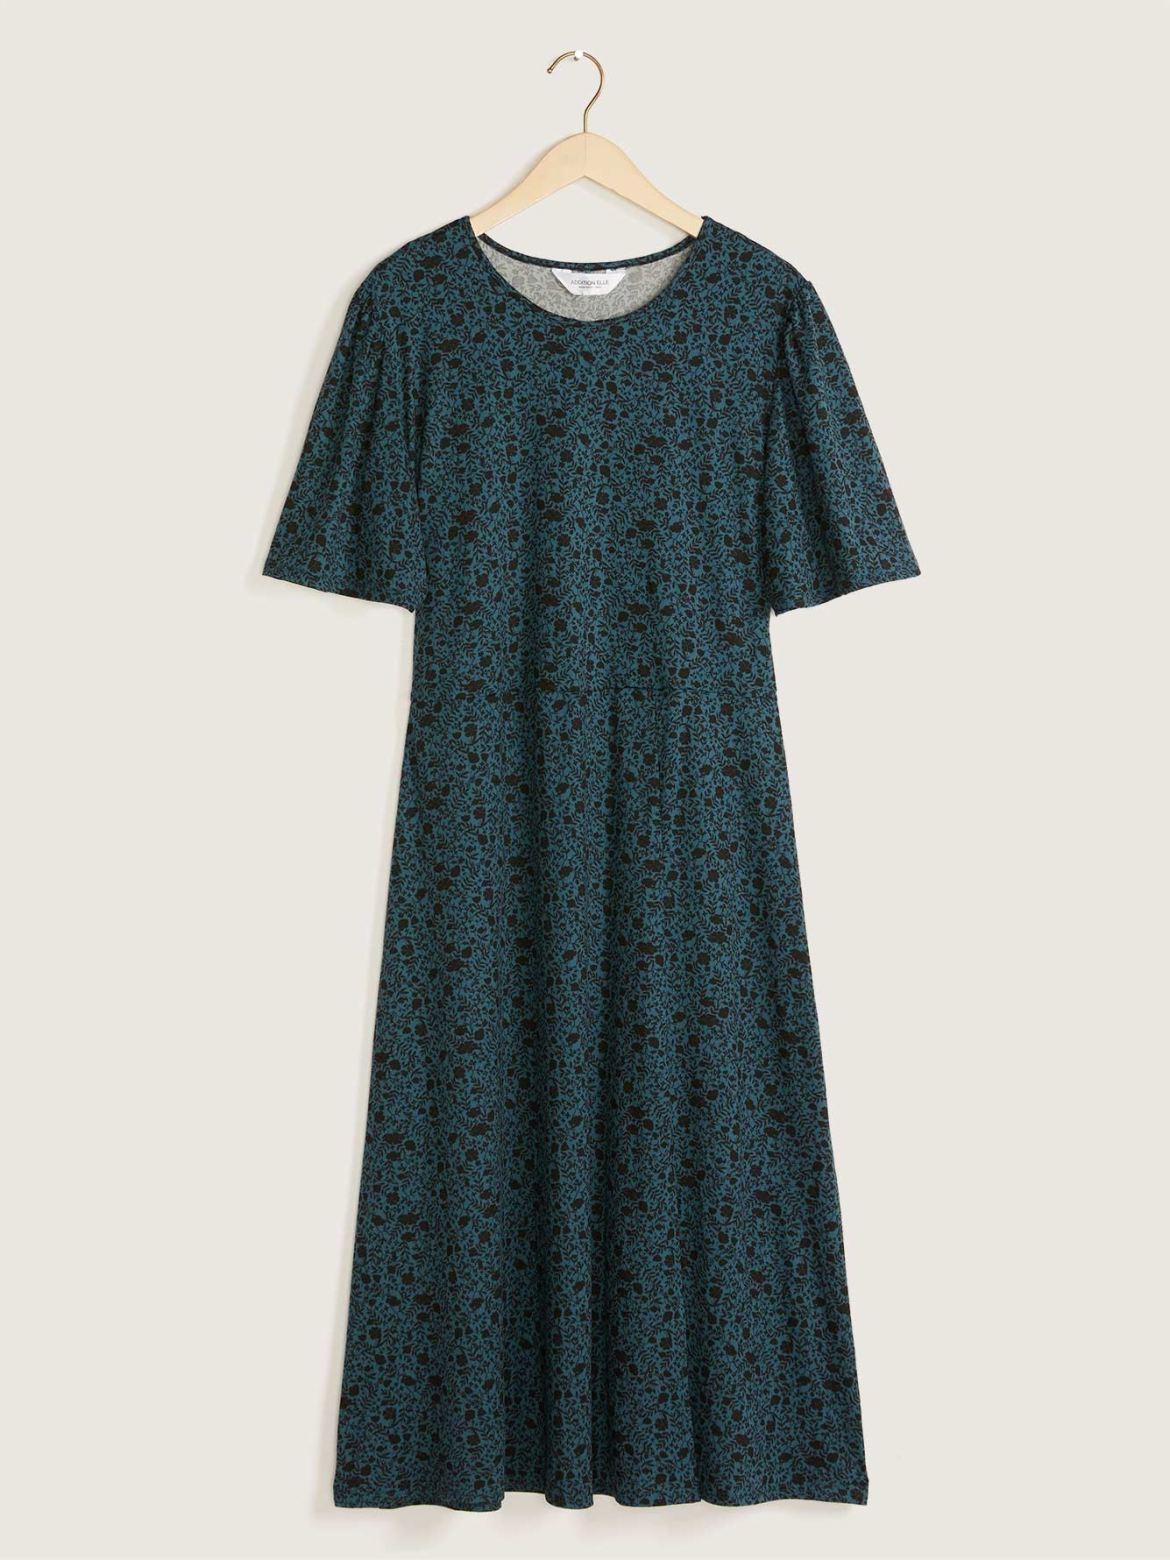 Printed Short Sleeve Midi Dress with Front Slit - Addition Elle